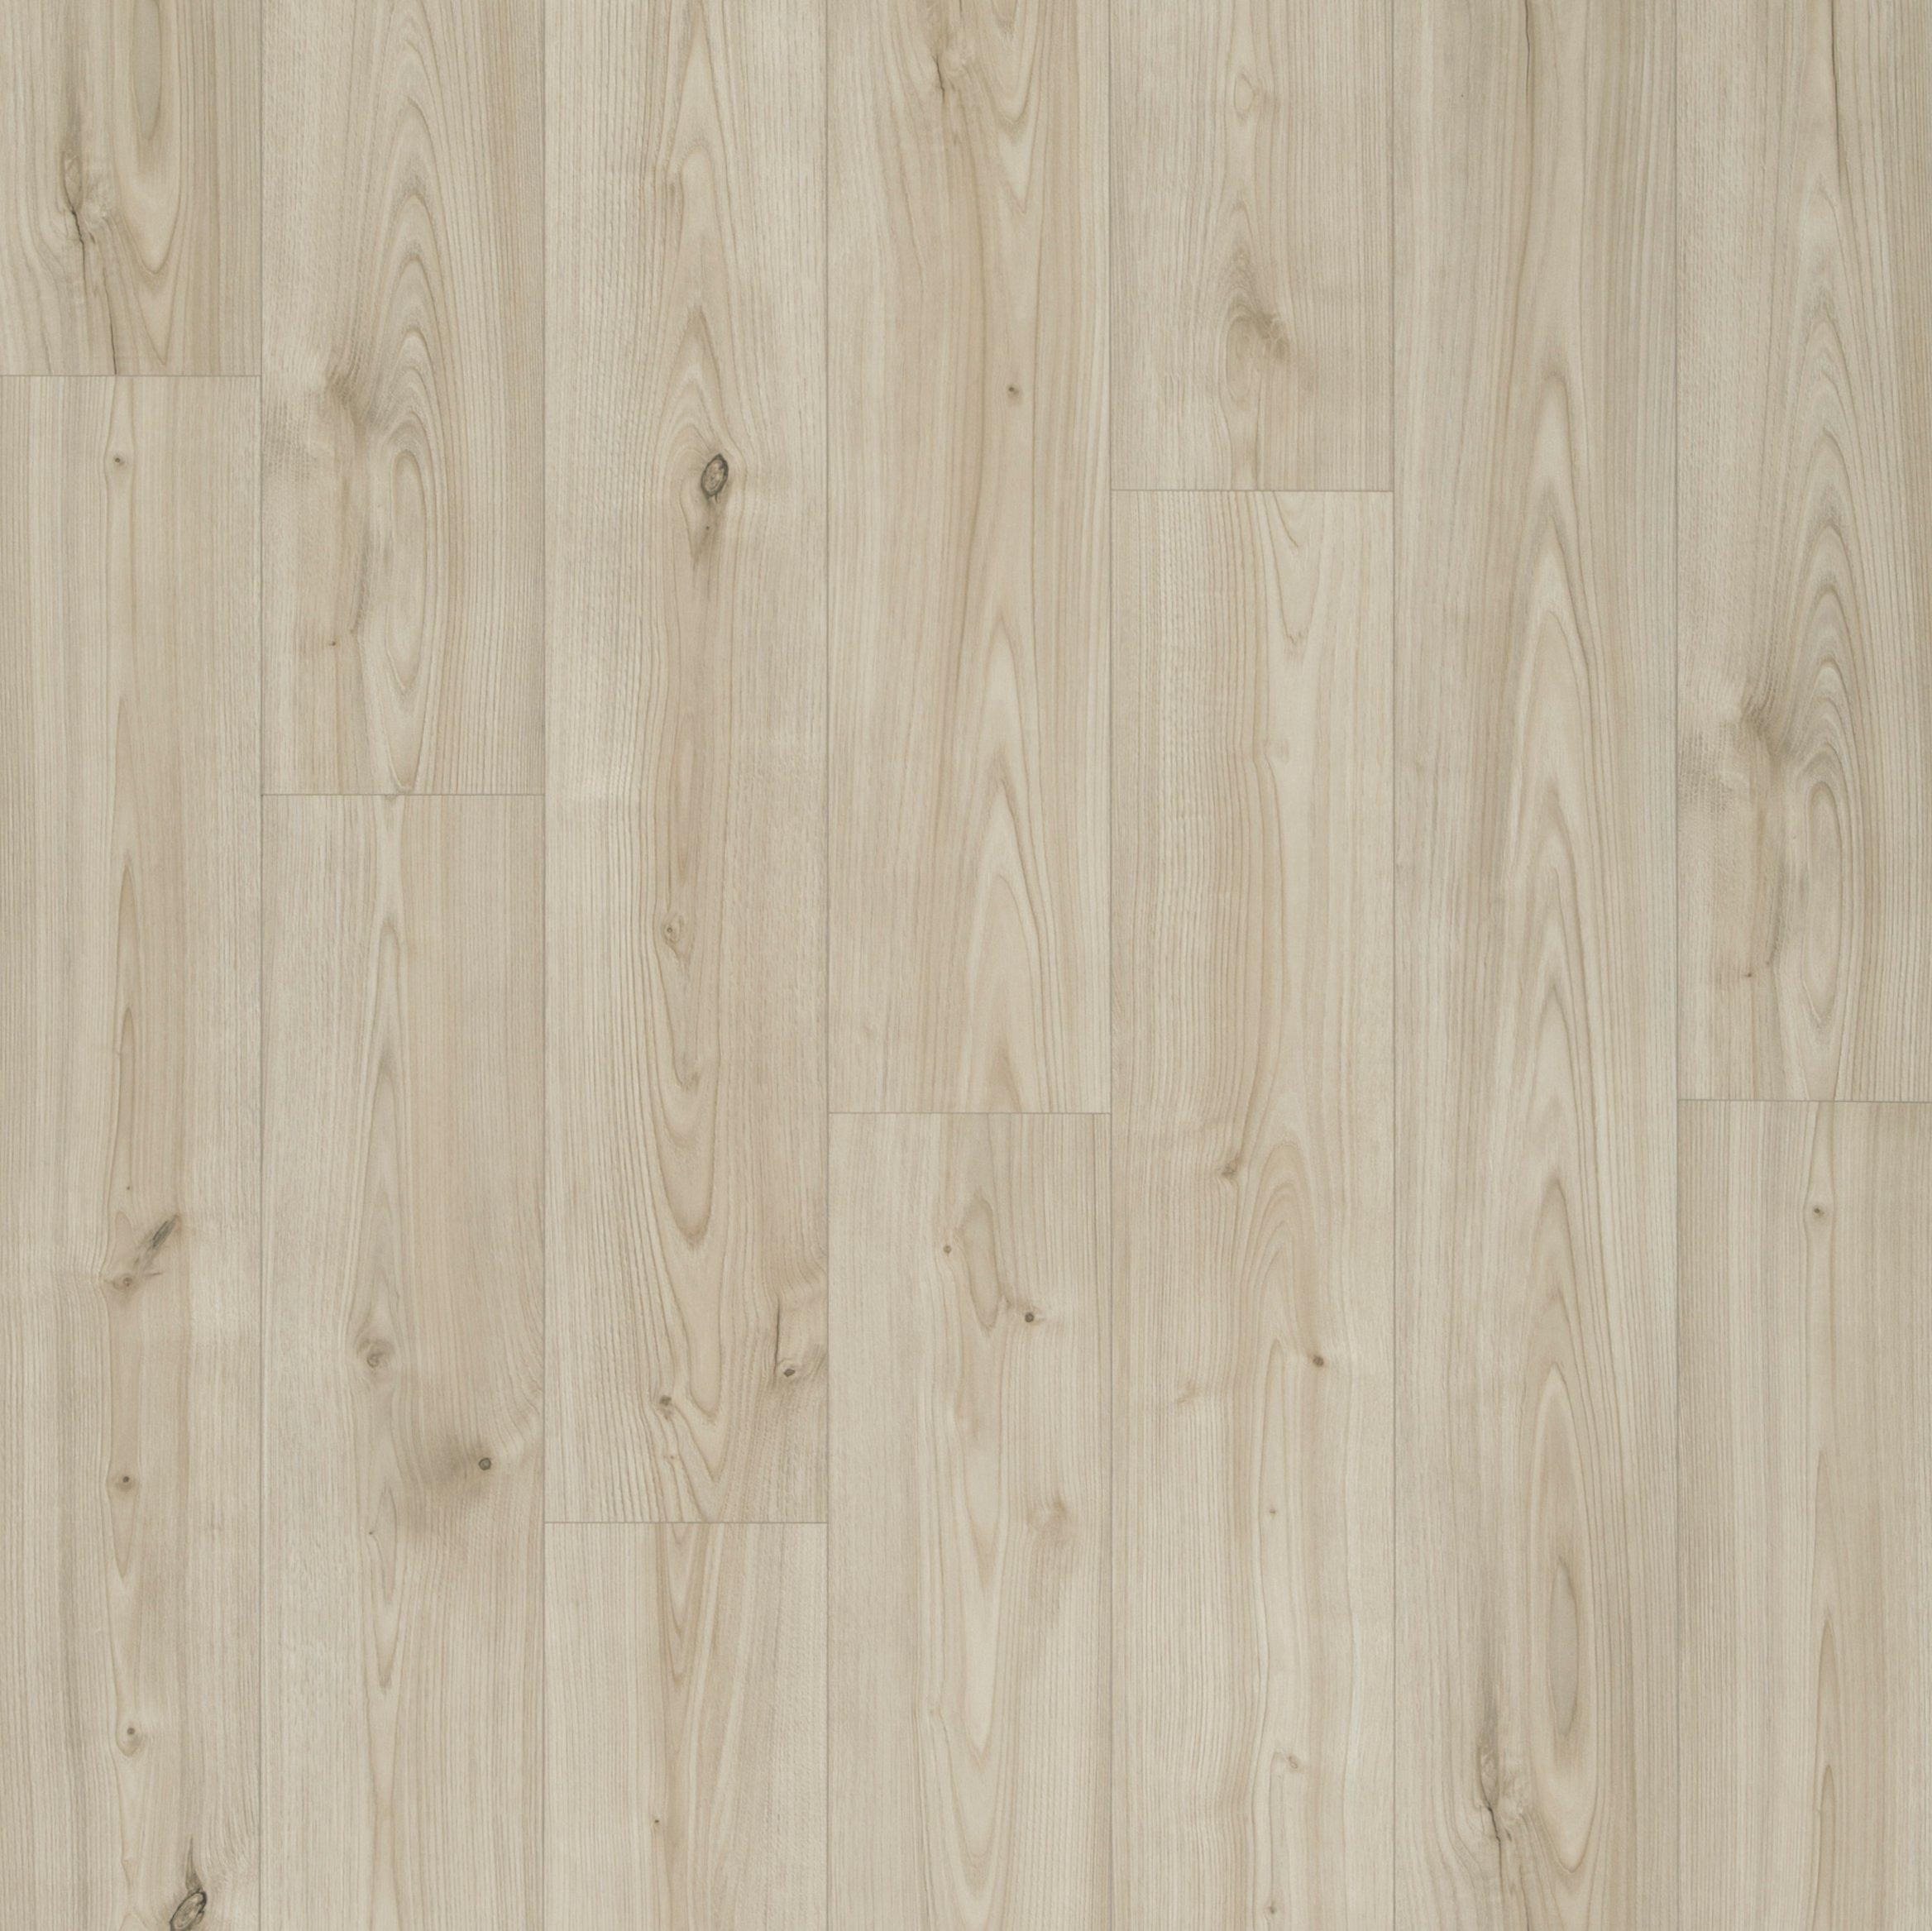 Beaumont Eco Resilient Flooring 7mm, Resilient Laminate Flooring